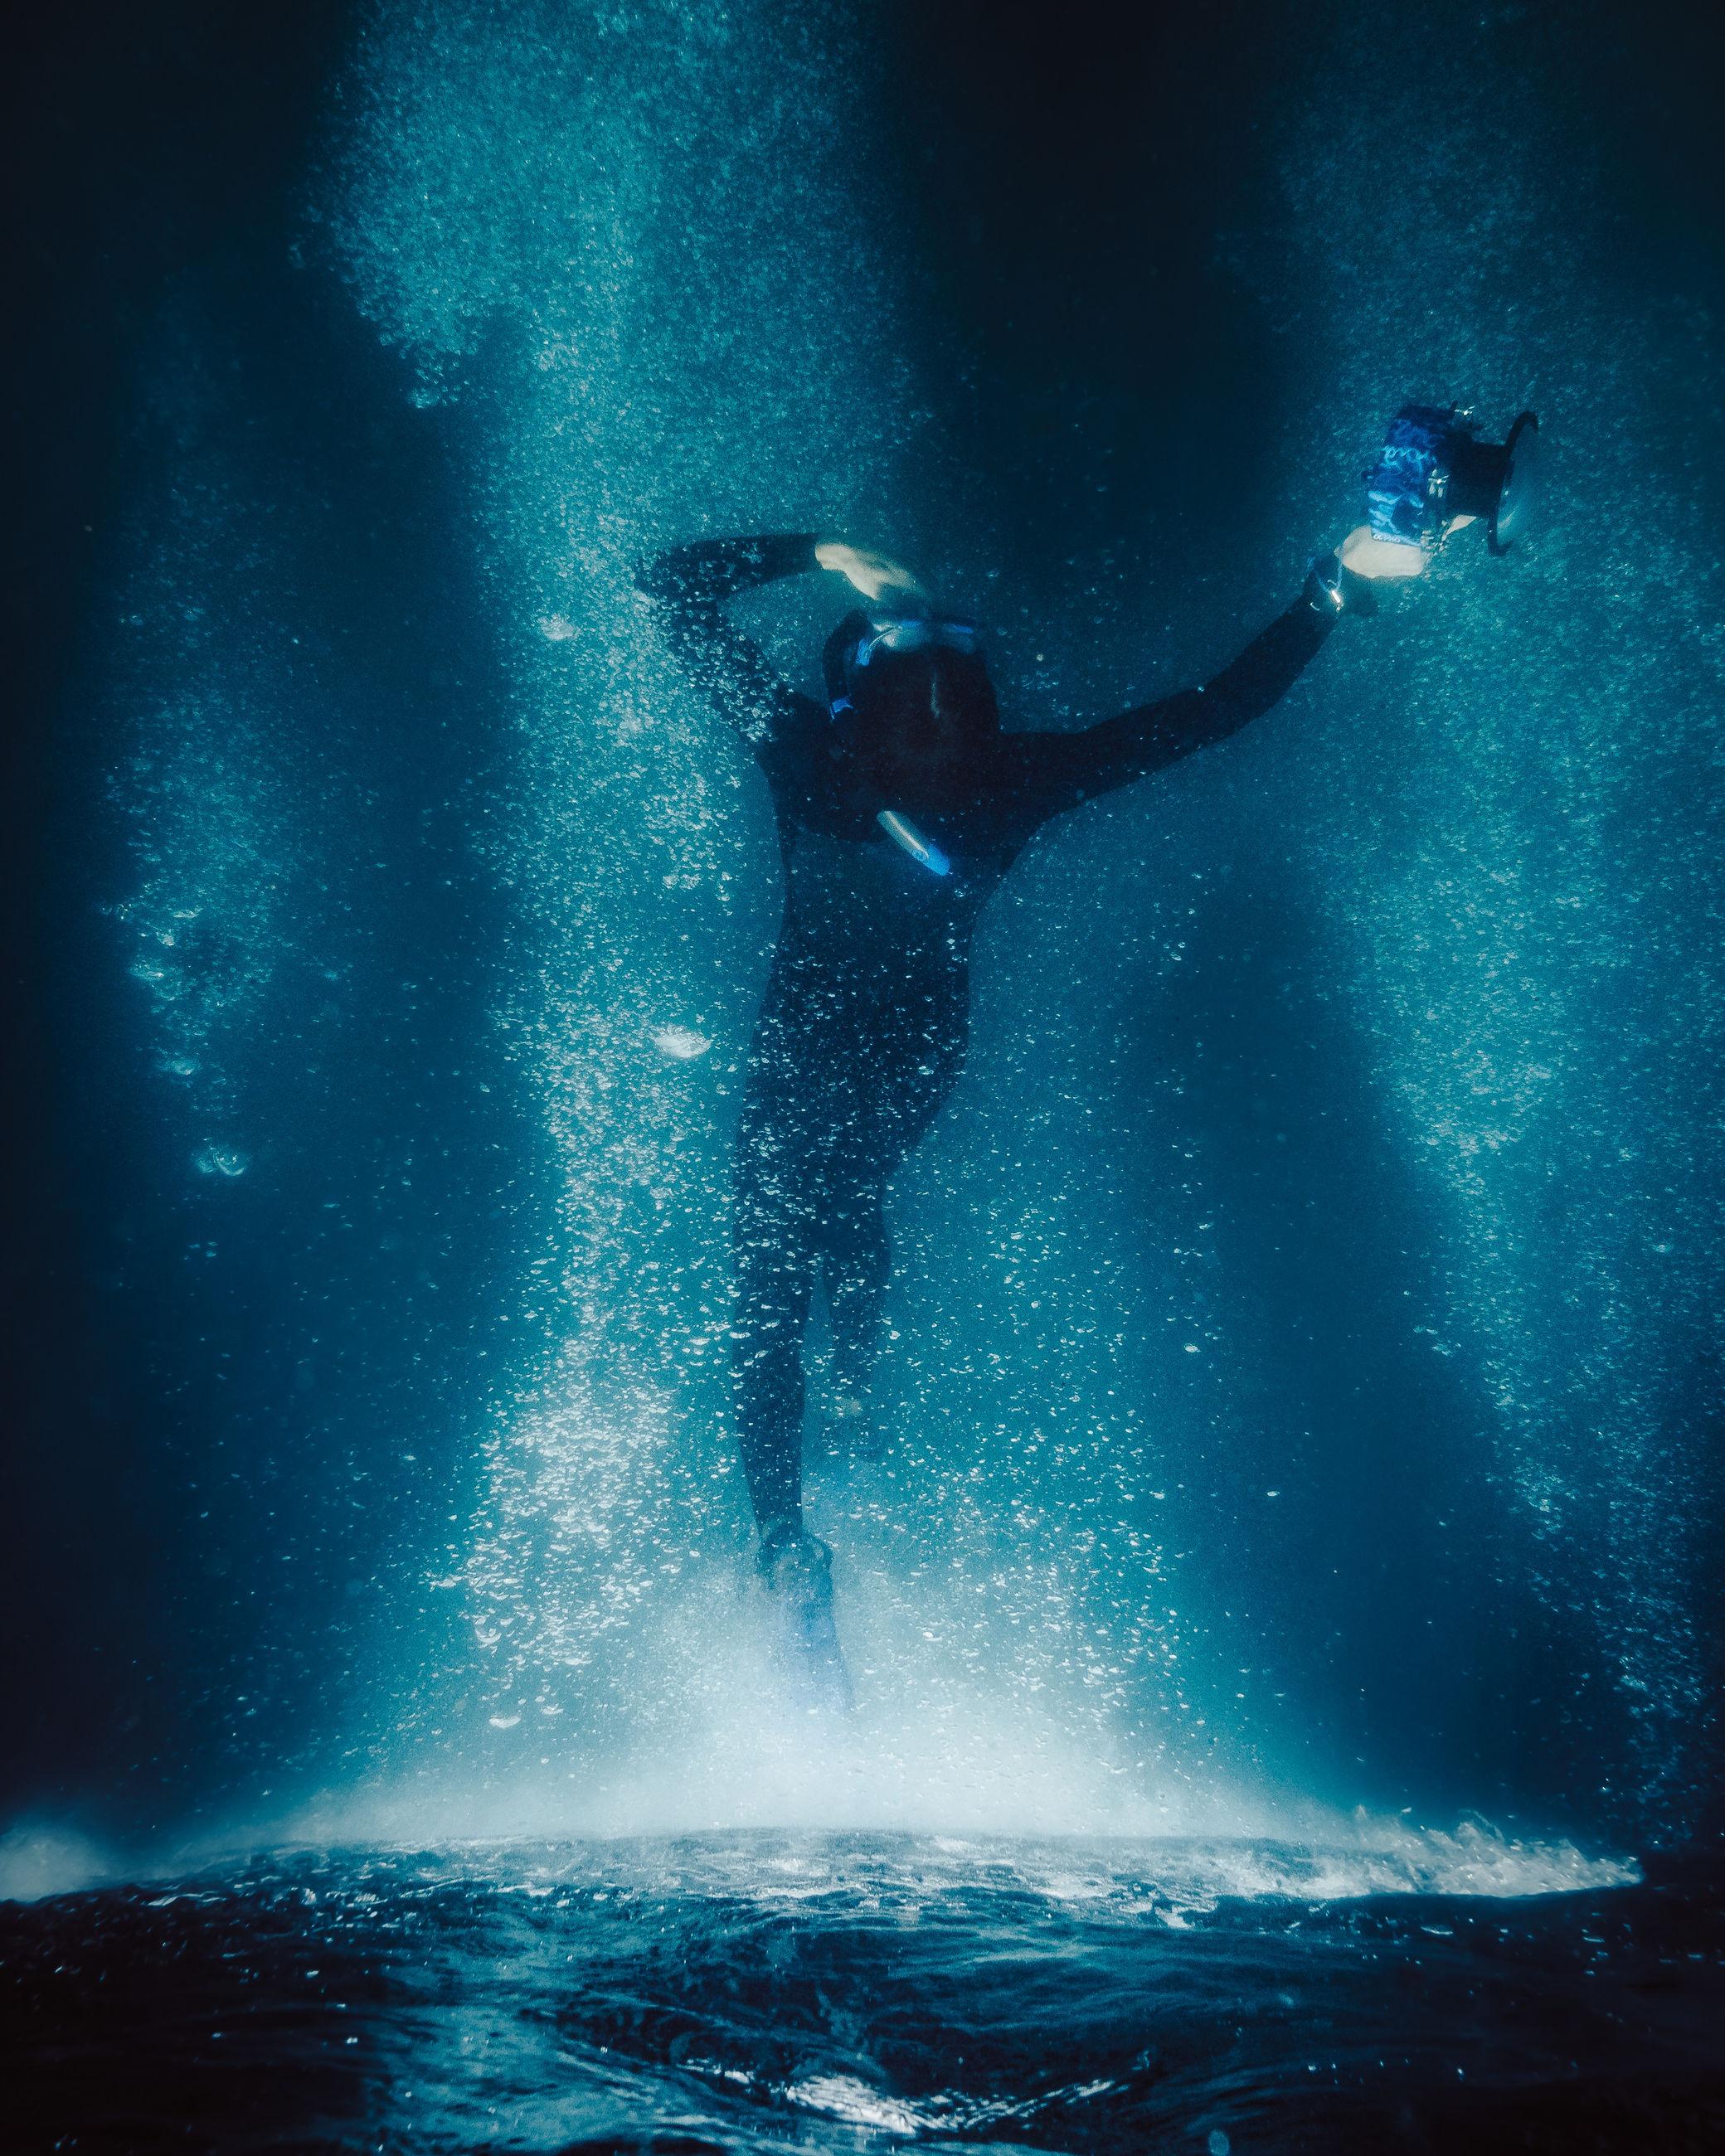 sea, water, underwater, sport, aquatic sport, undersea, full length, adventure, swimming, nature, motion, scuba diving, men, exploration, leisure activity, one person, diving flipper, diving equipment, outdoors, underwater diving, human arm